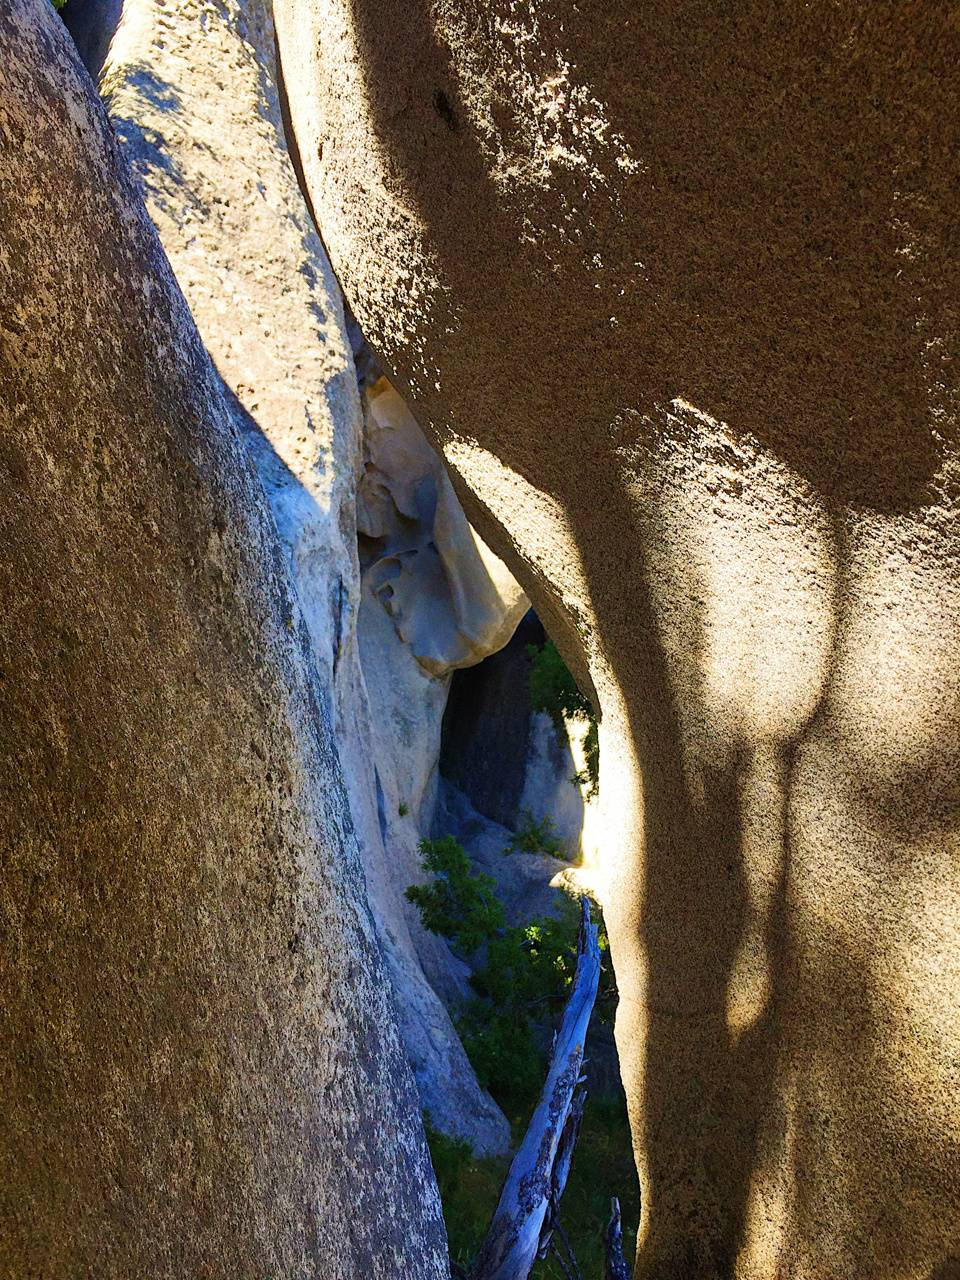 Rock separation